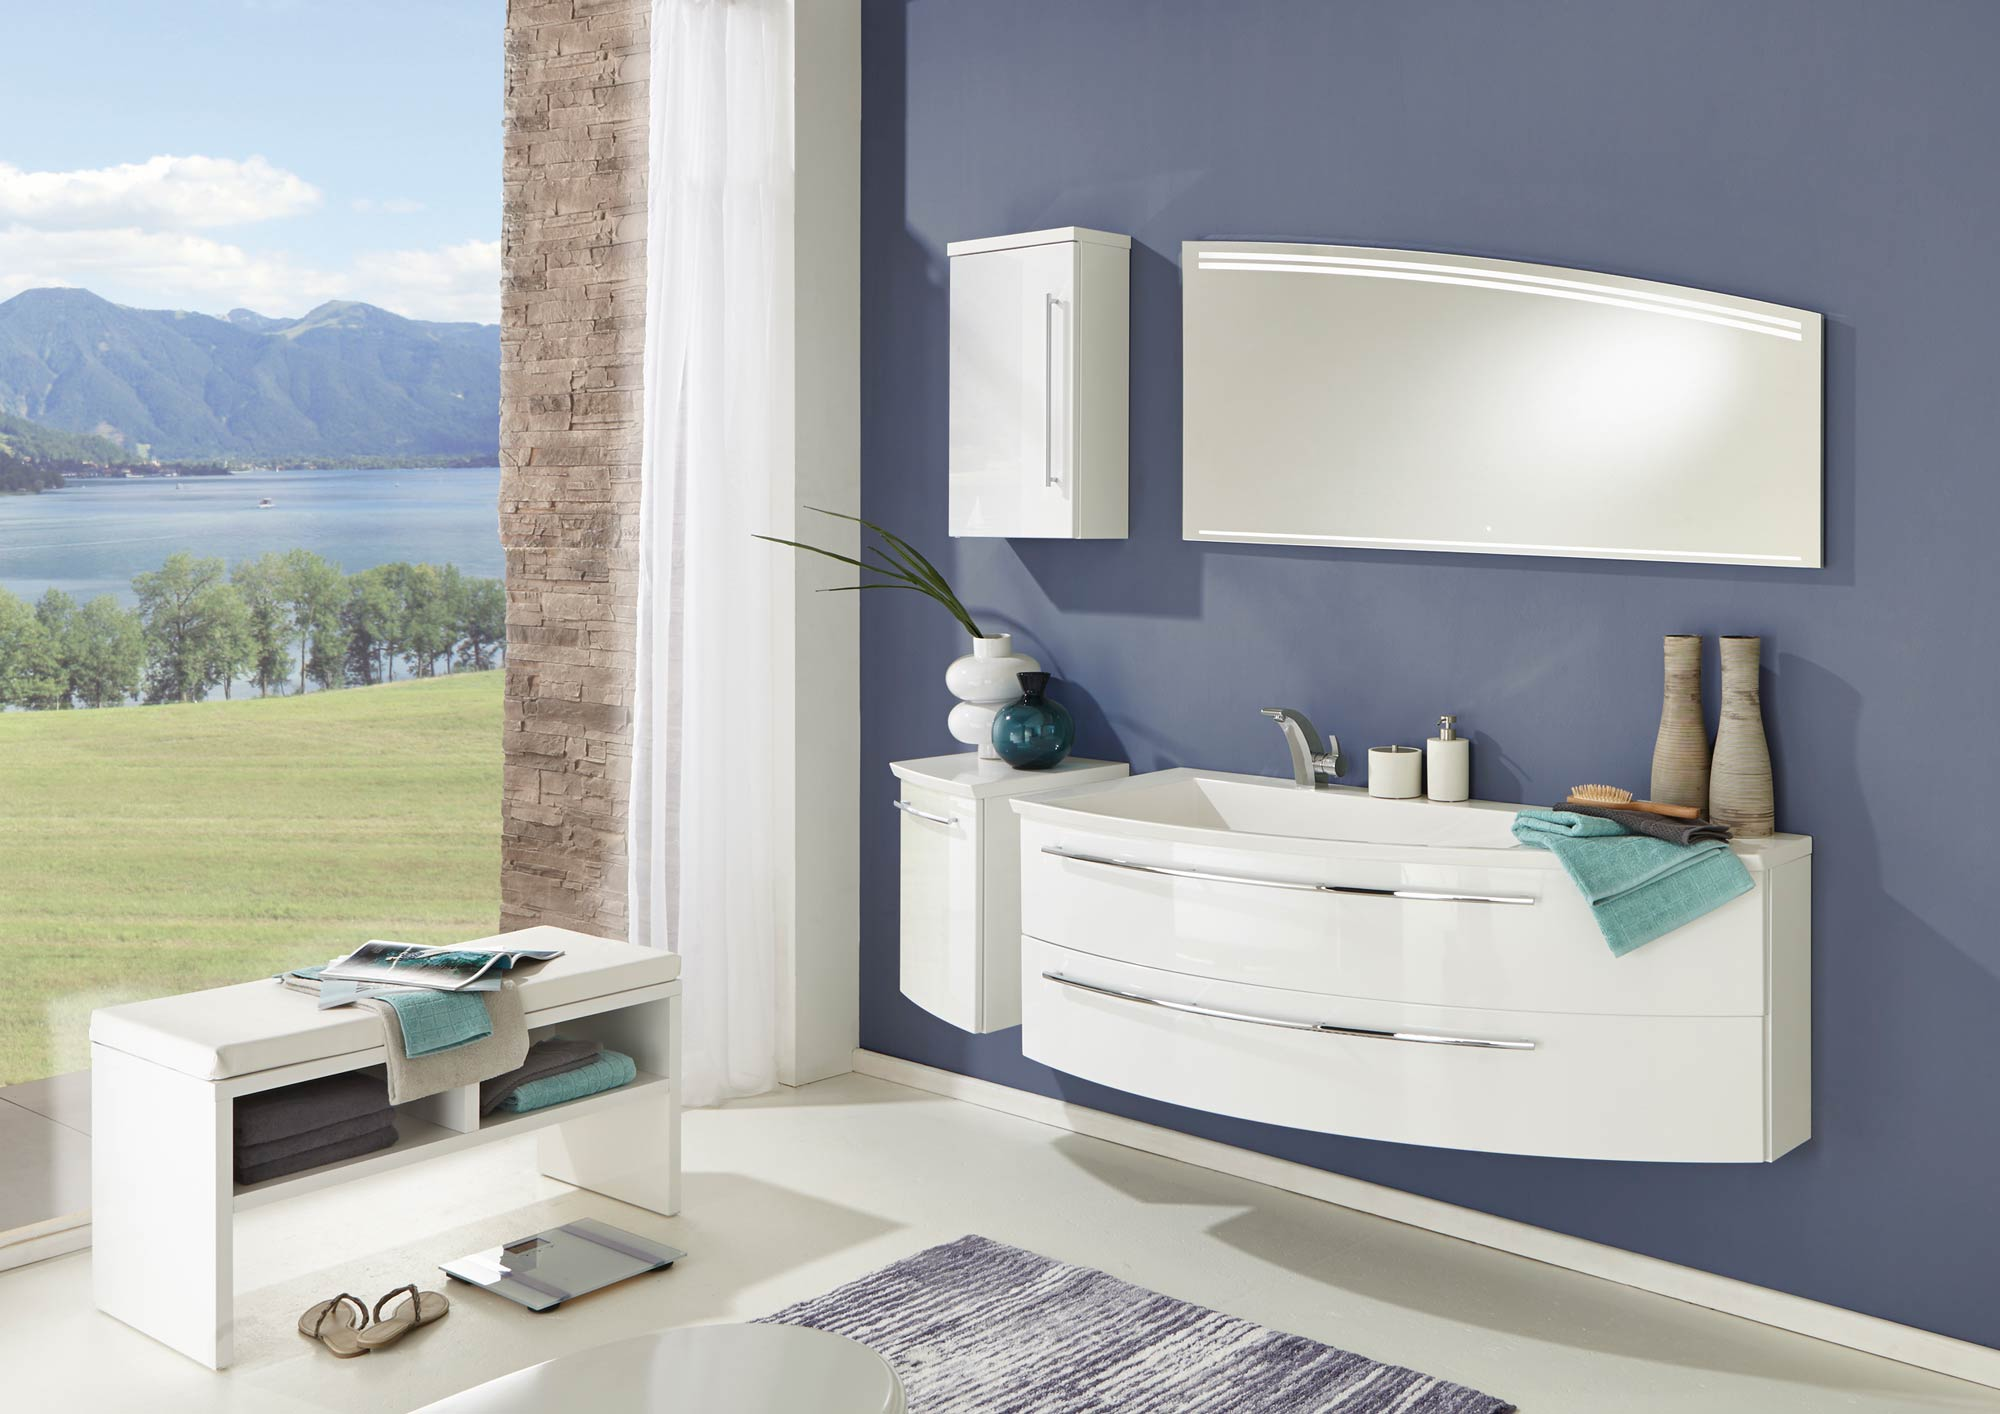 crescendo meubles de salle de bains baignoires fabricant fran ais cedam. Black Bedroom Furniture Sets. Home Design Ideas